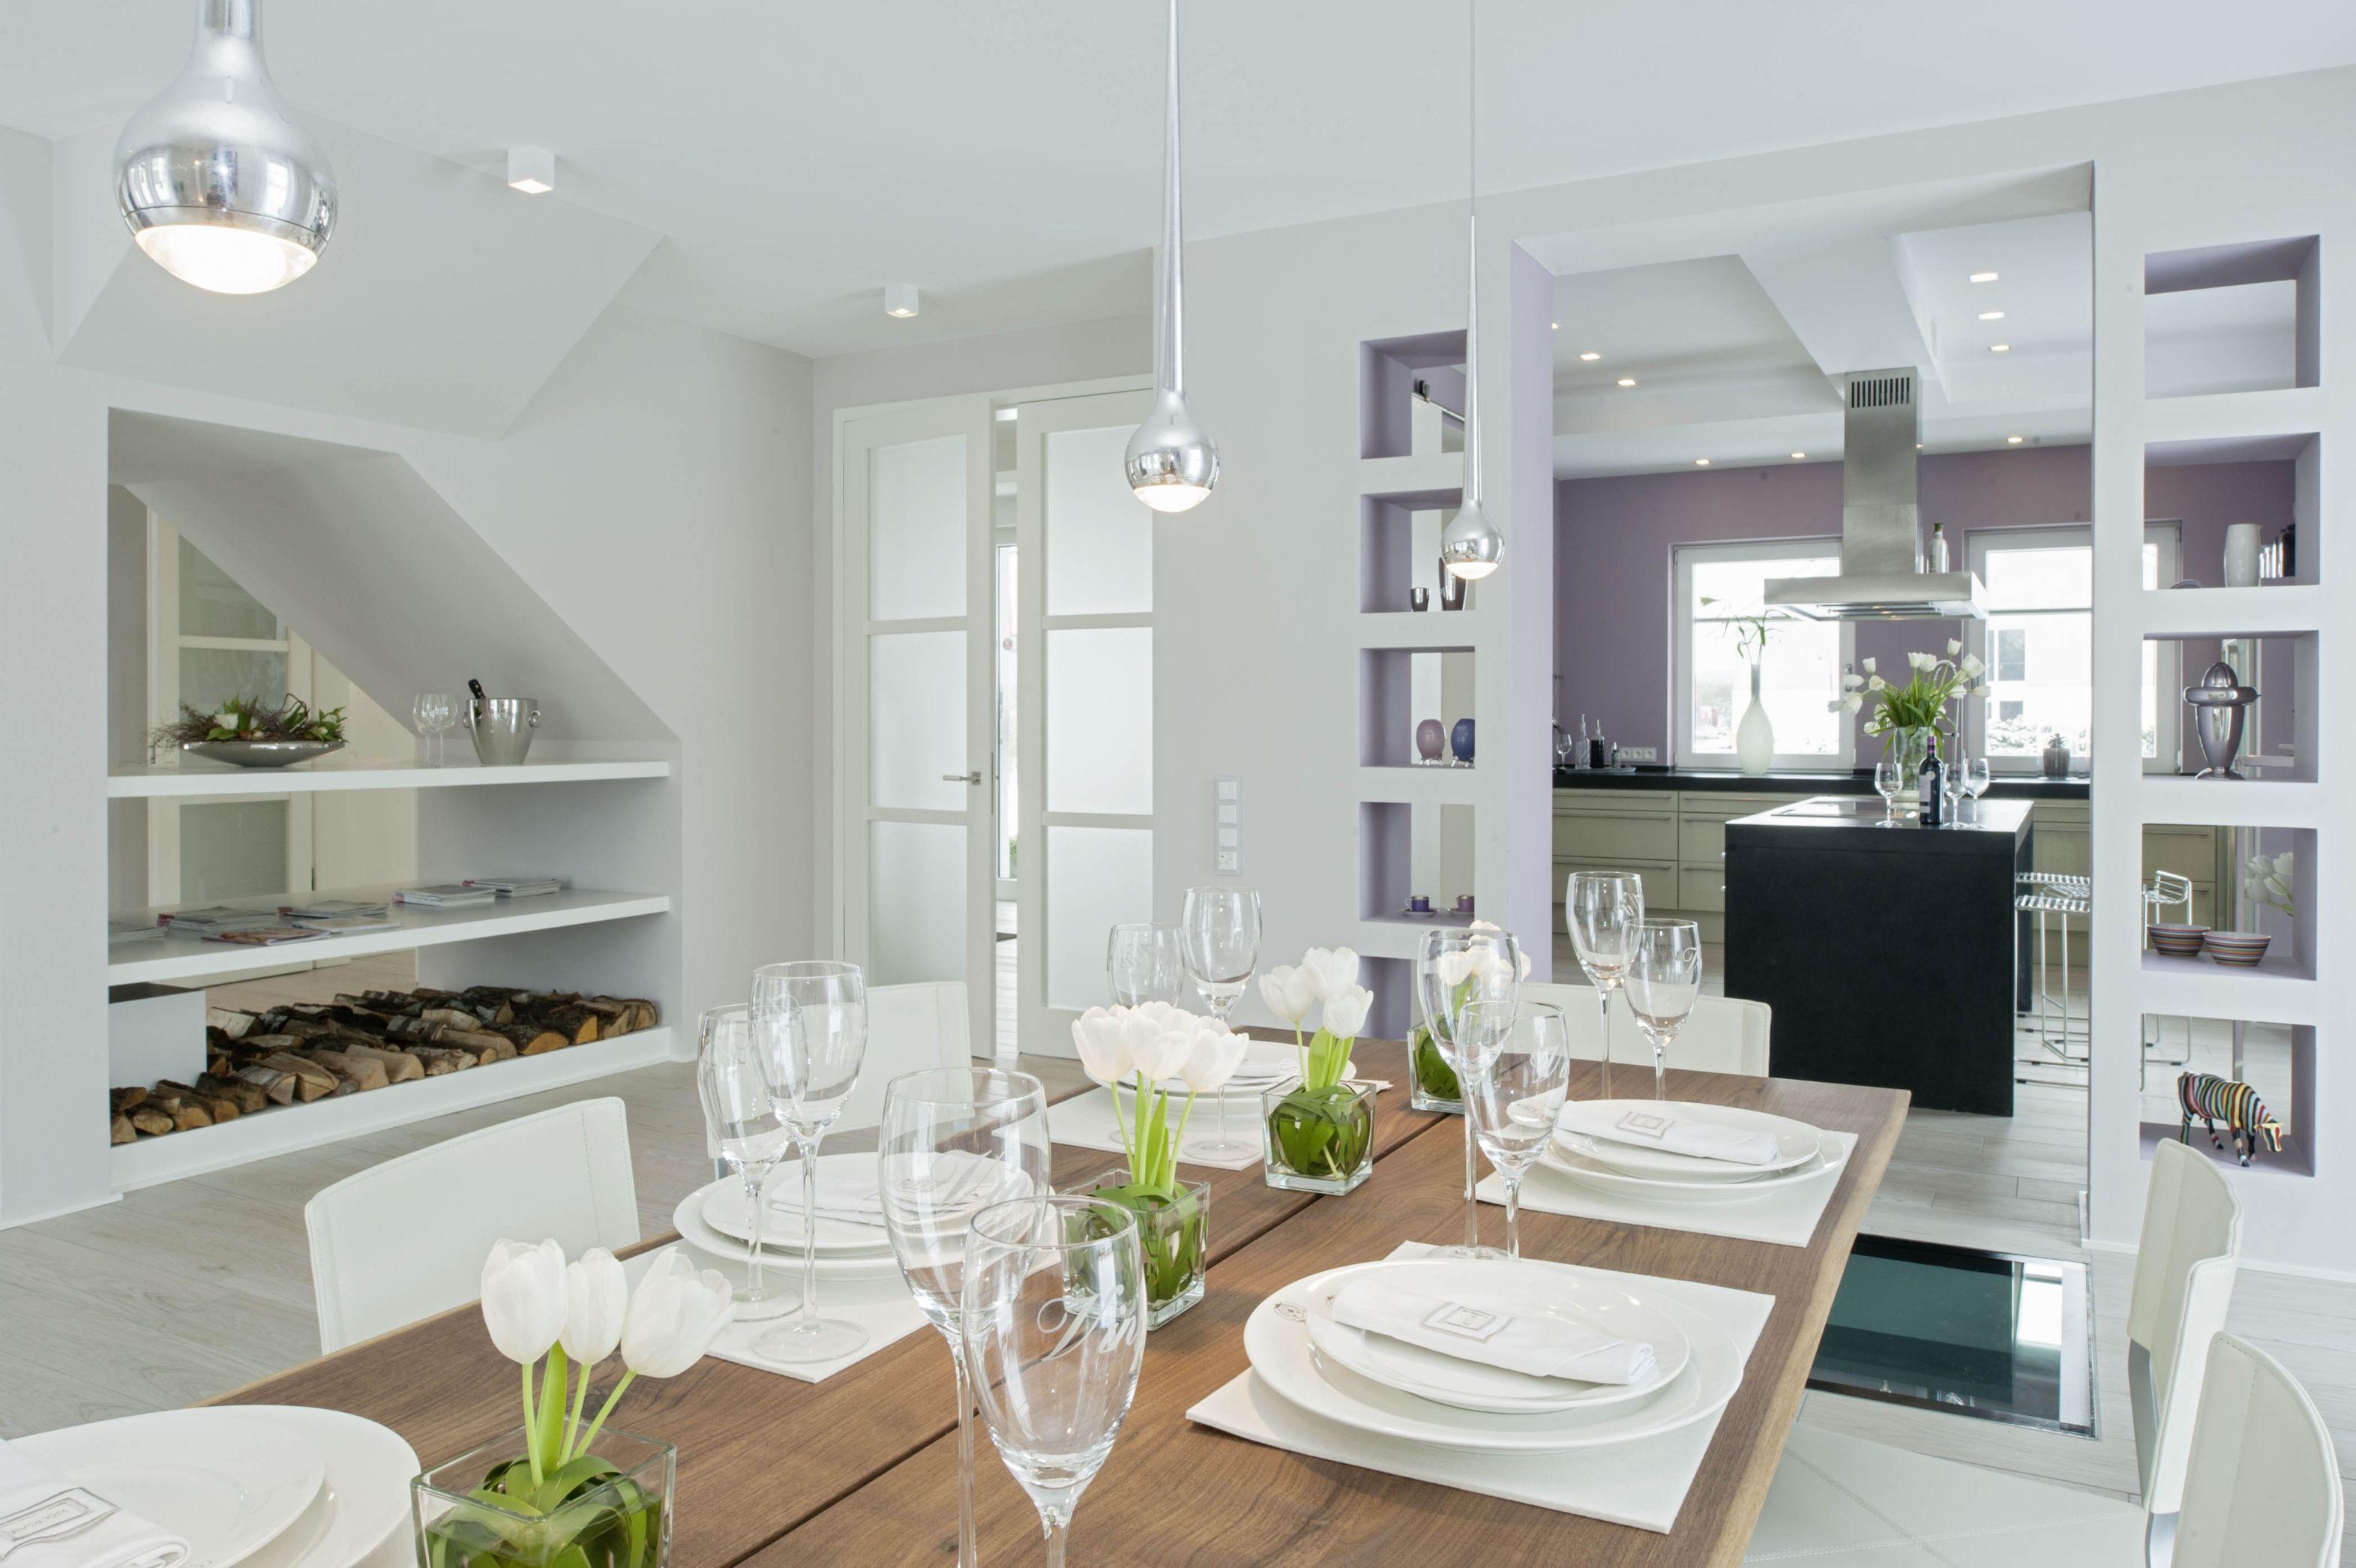 limited designed by jette joop traumhaus f r individualisten viebrockhaus designelemente. Black Bedroom Furniture Sets. Home Design Ideas